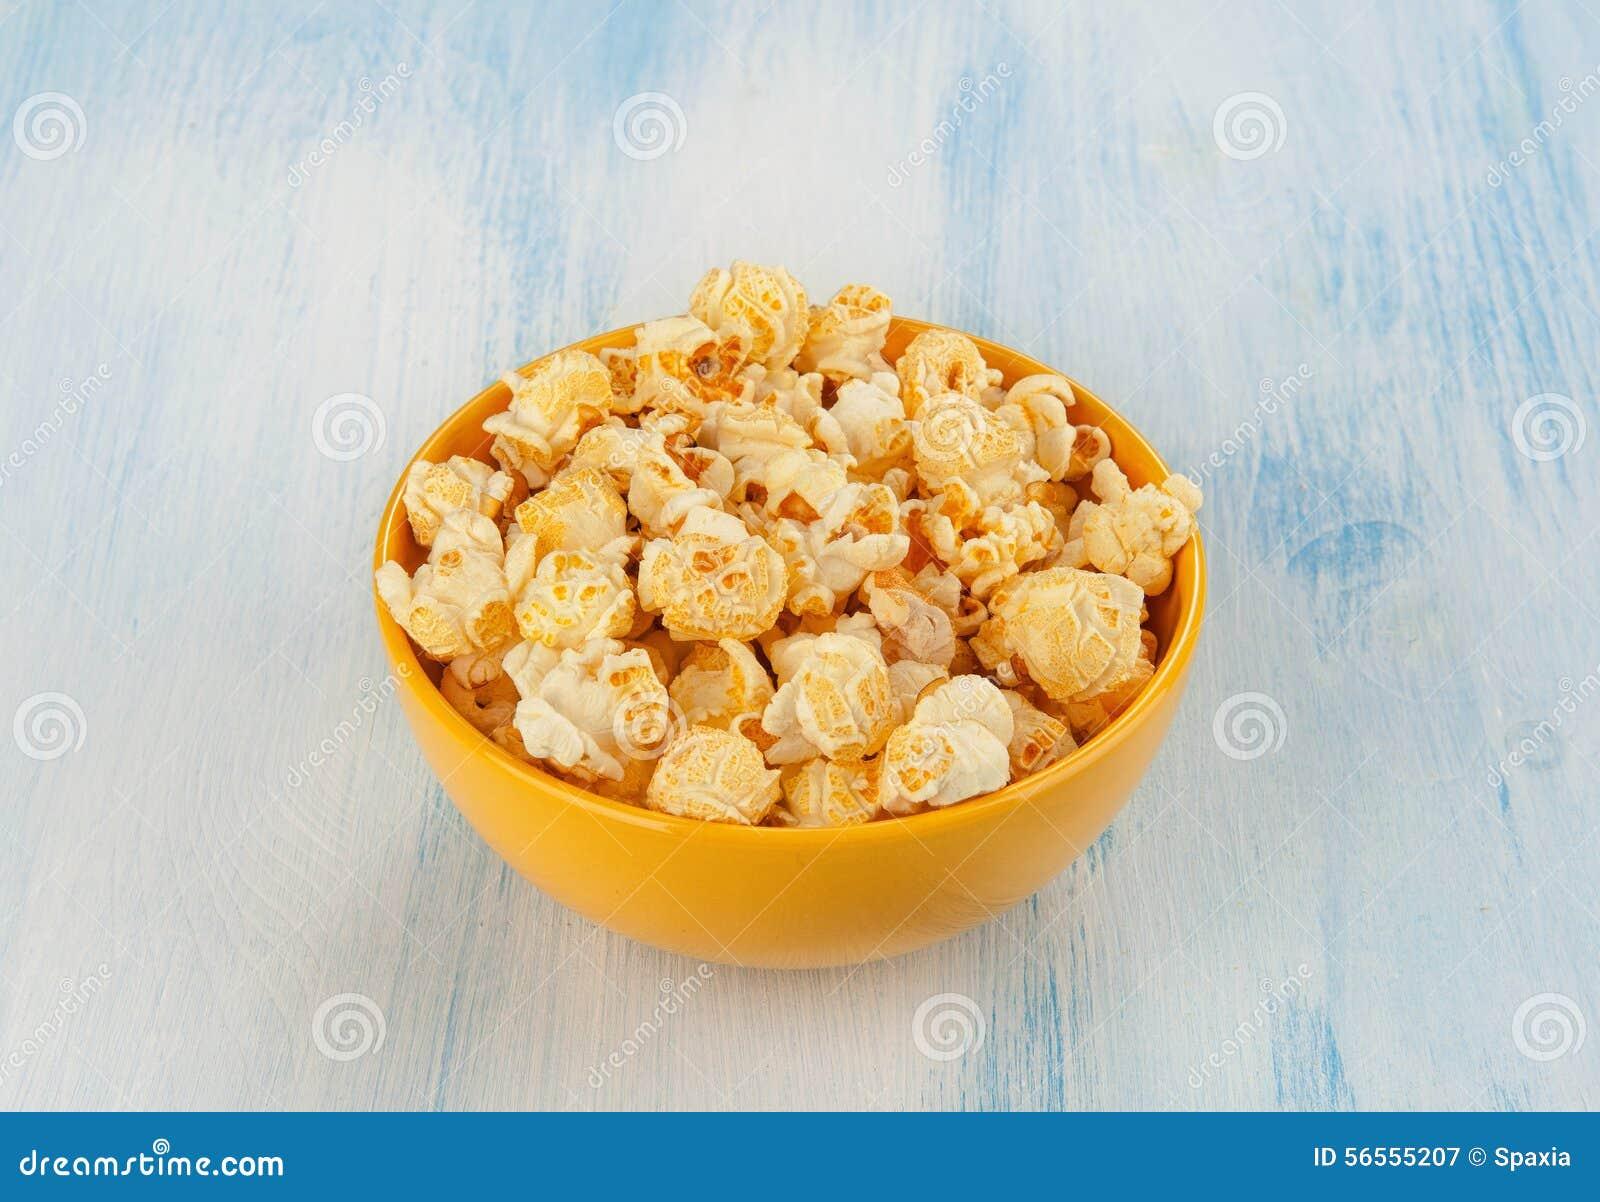 Download Popcorn στοκ εικόνα. εικόνα από ορεκτικός, τρόφιμα, φάτε - 56555207